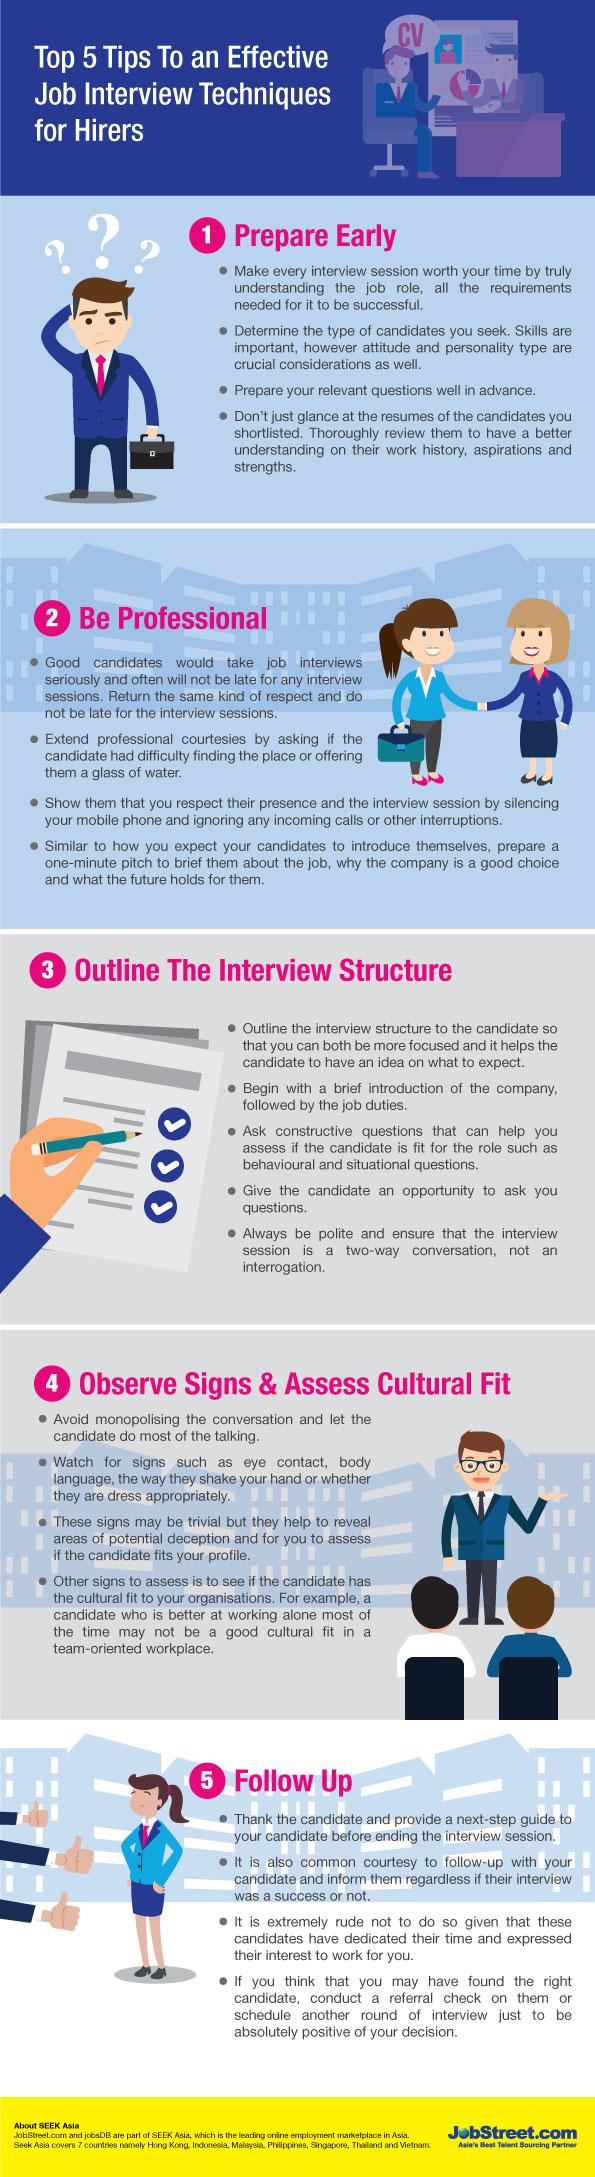 effective job interview techniques infographic hirer top 5 tips to an effective - Job Interview Techniques Tips